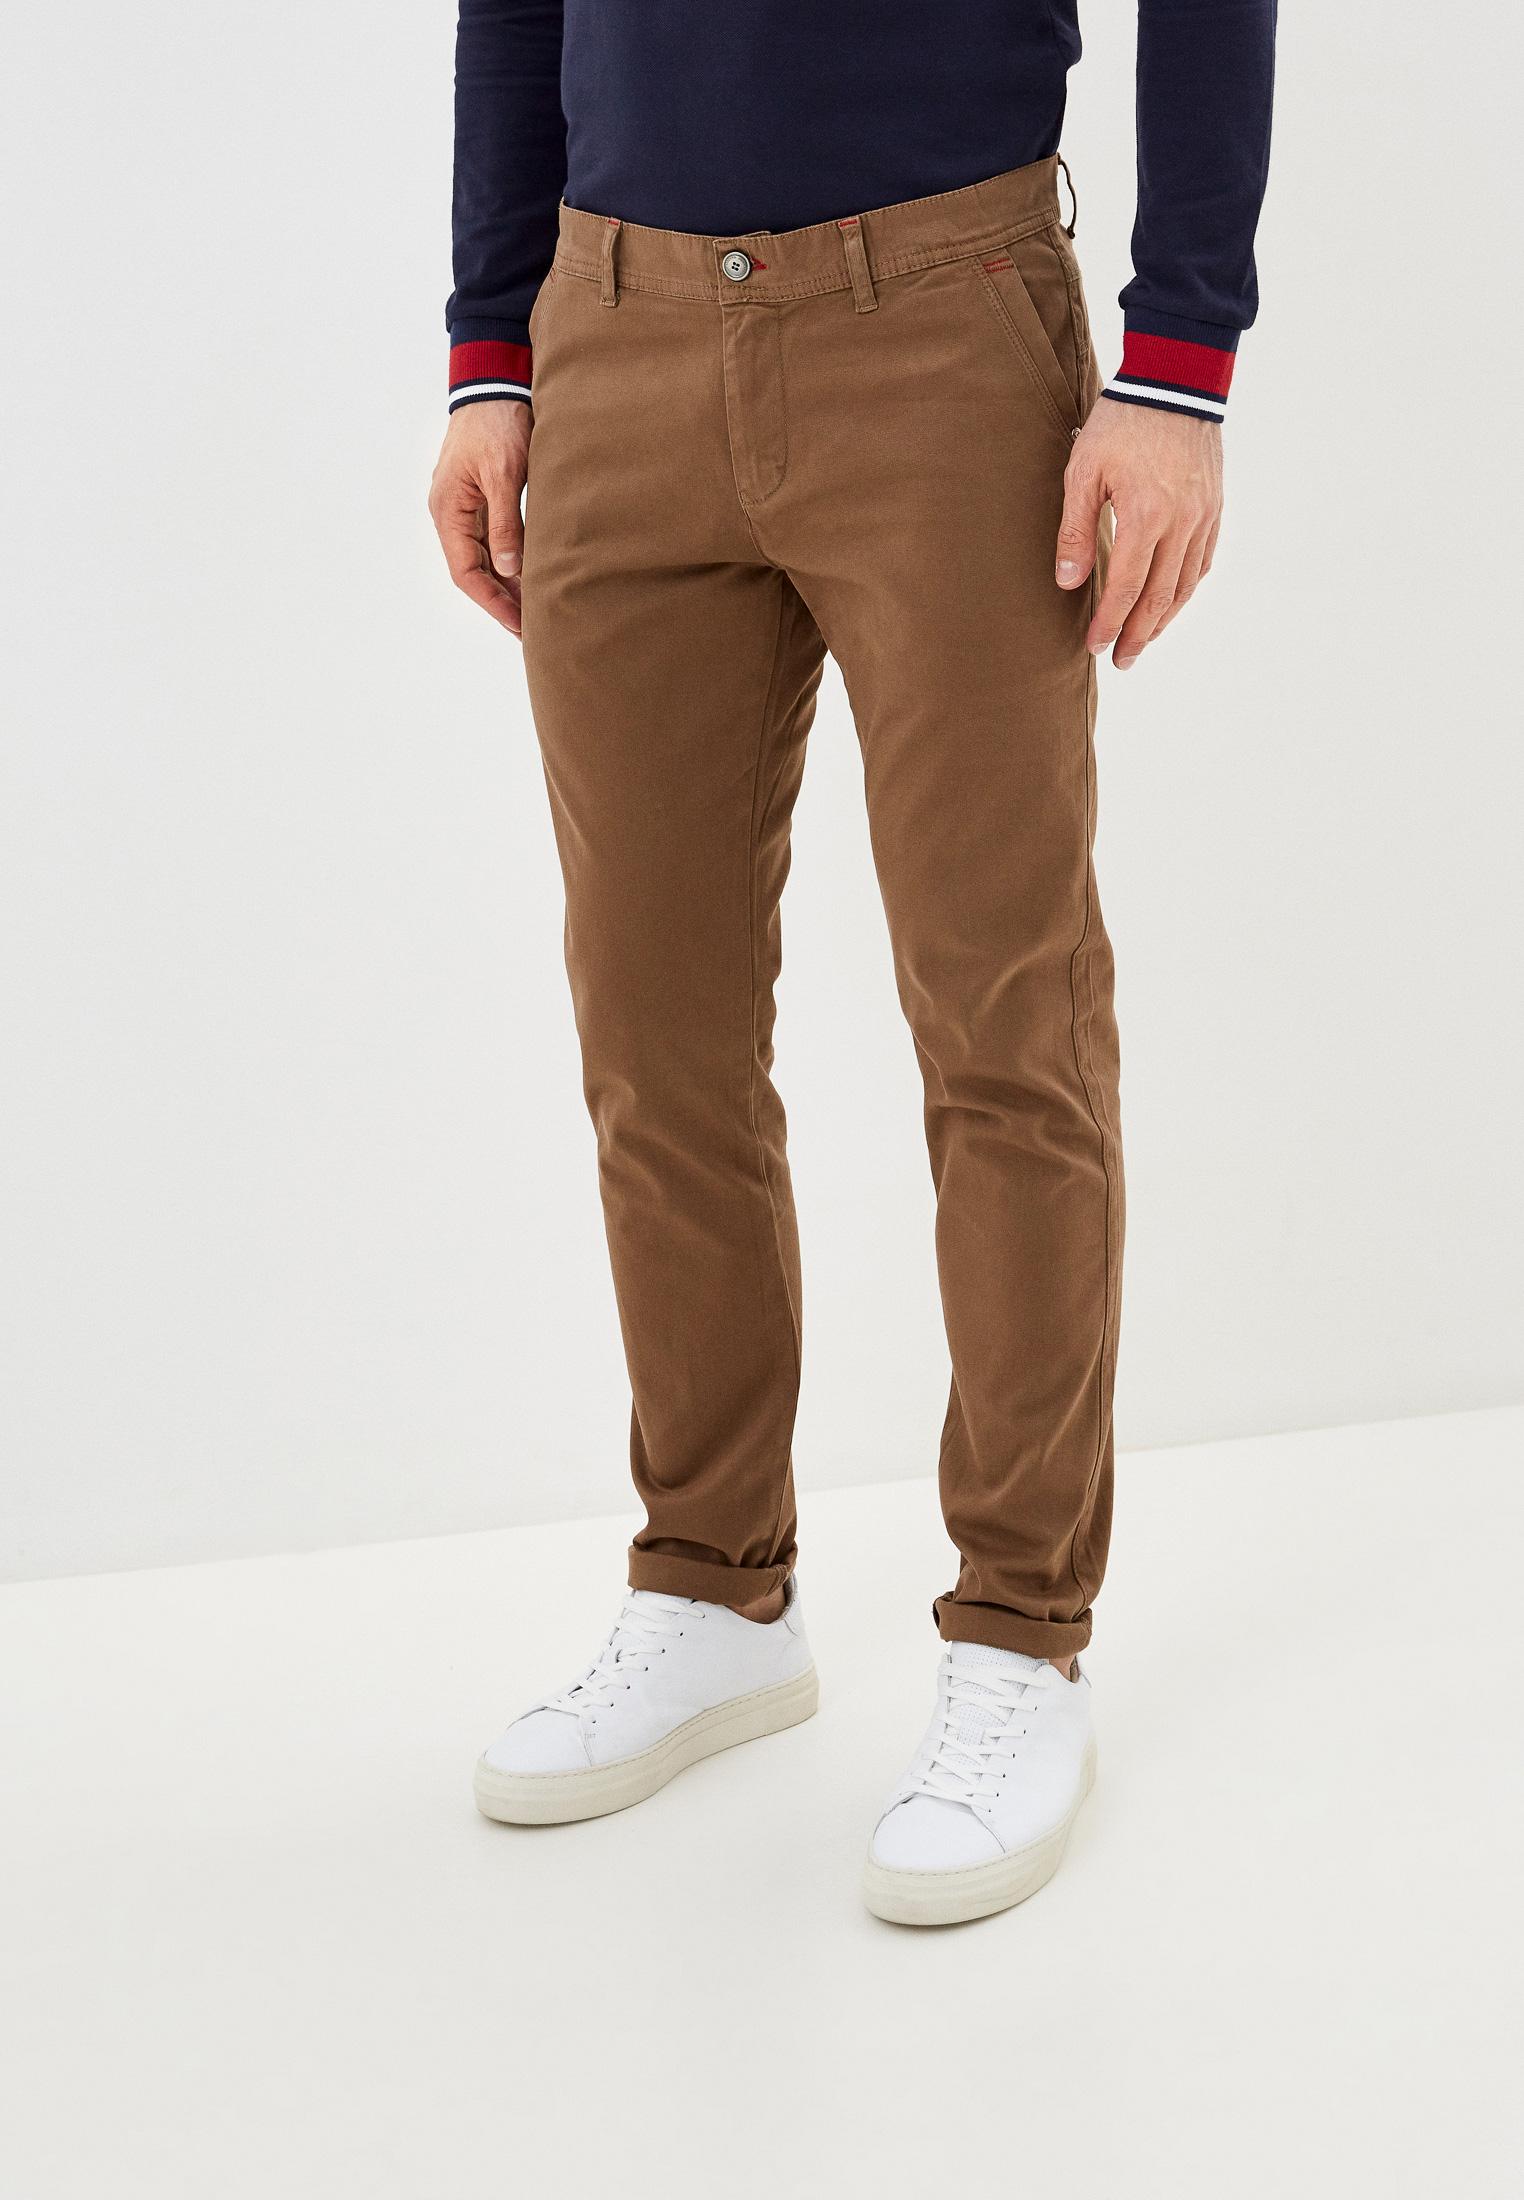 Мужские повседневные брюки JIMMY SANDERS (Джимми Сандерс) 19W PM11001 VISON